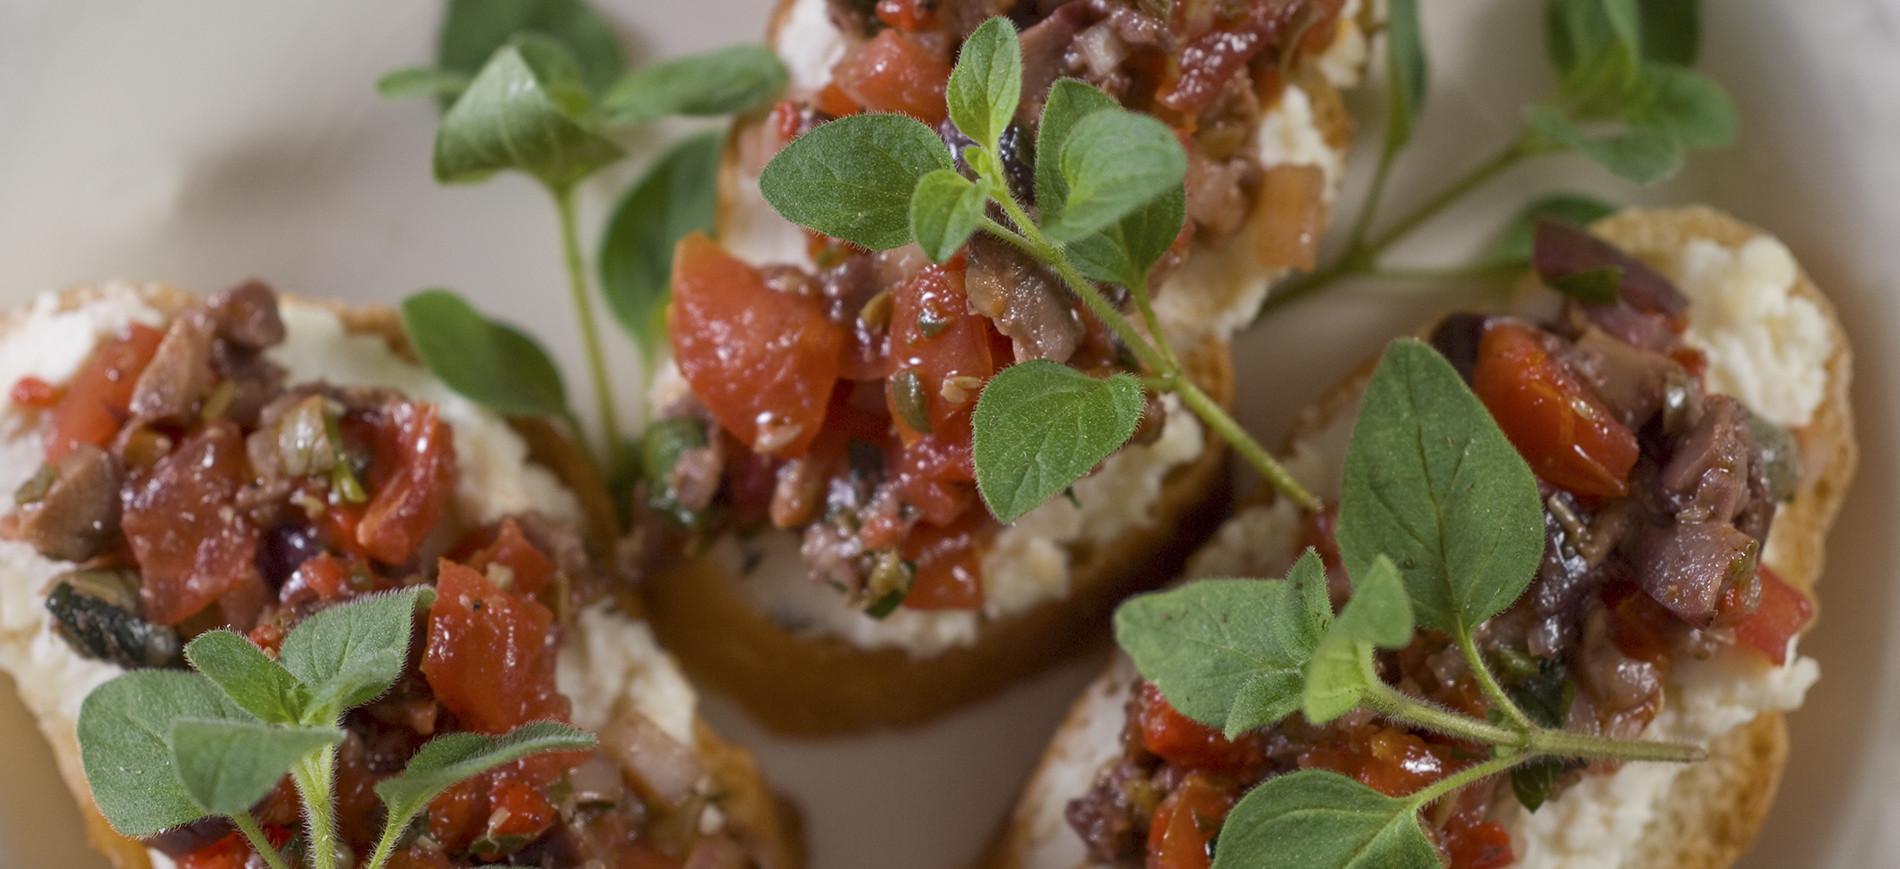 Three pieces of bruschetta topped with chopped tomato & oregano garnish